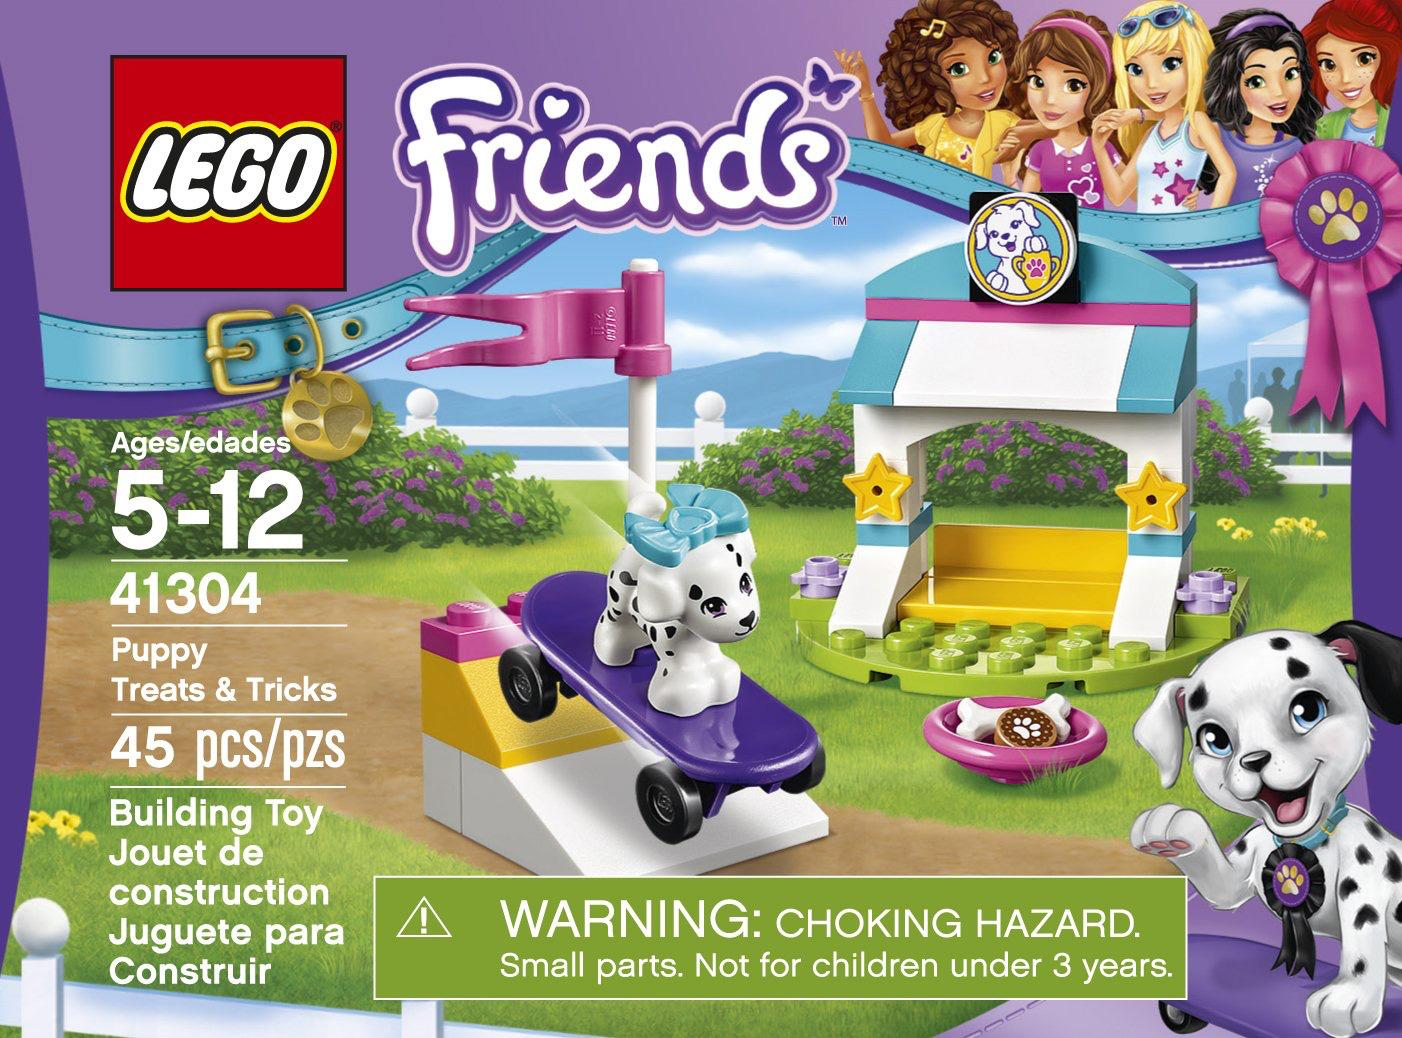 Lego Friends Dogtown